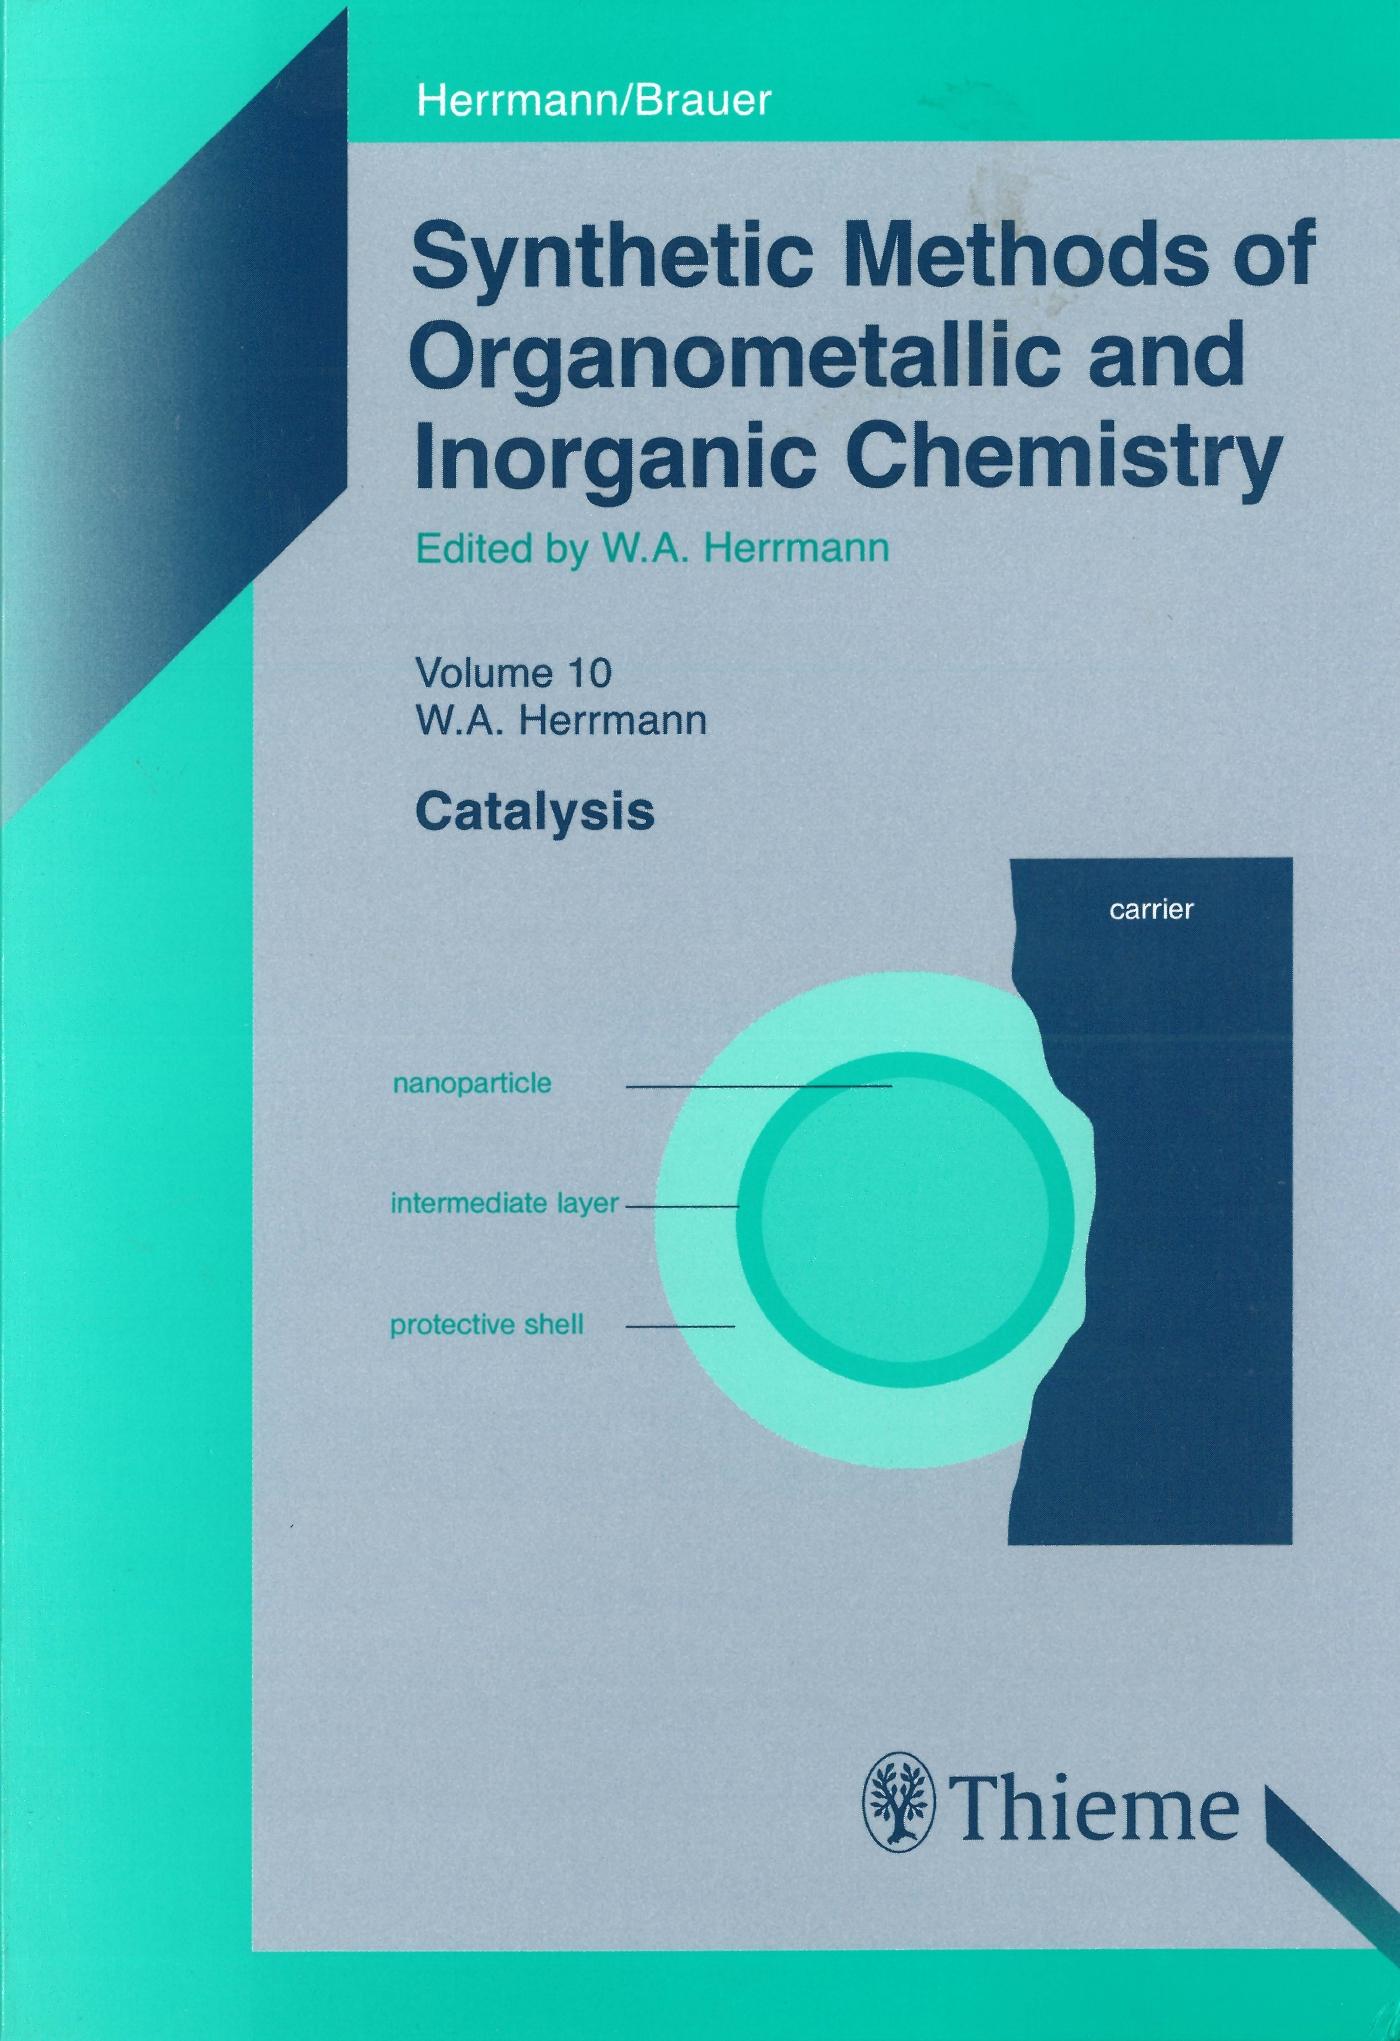 Synthetic Methods of Organometallic and Inorganic Chemistry, Volume 10, 2002